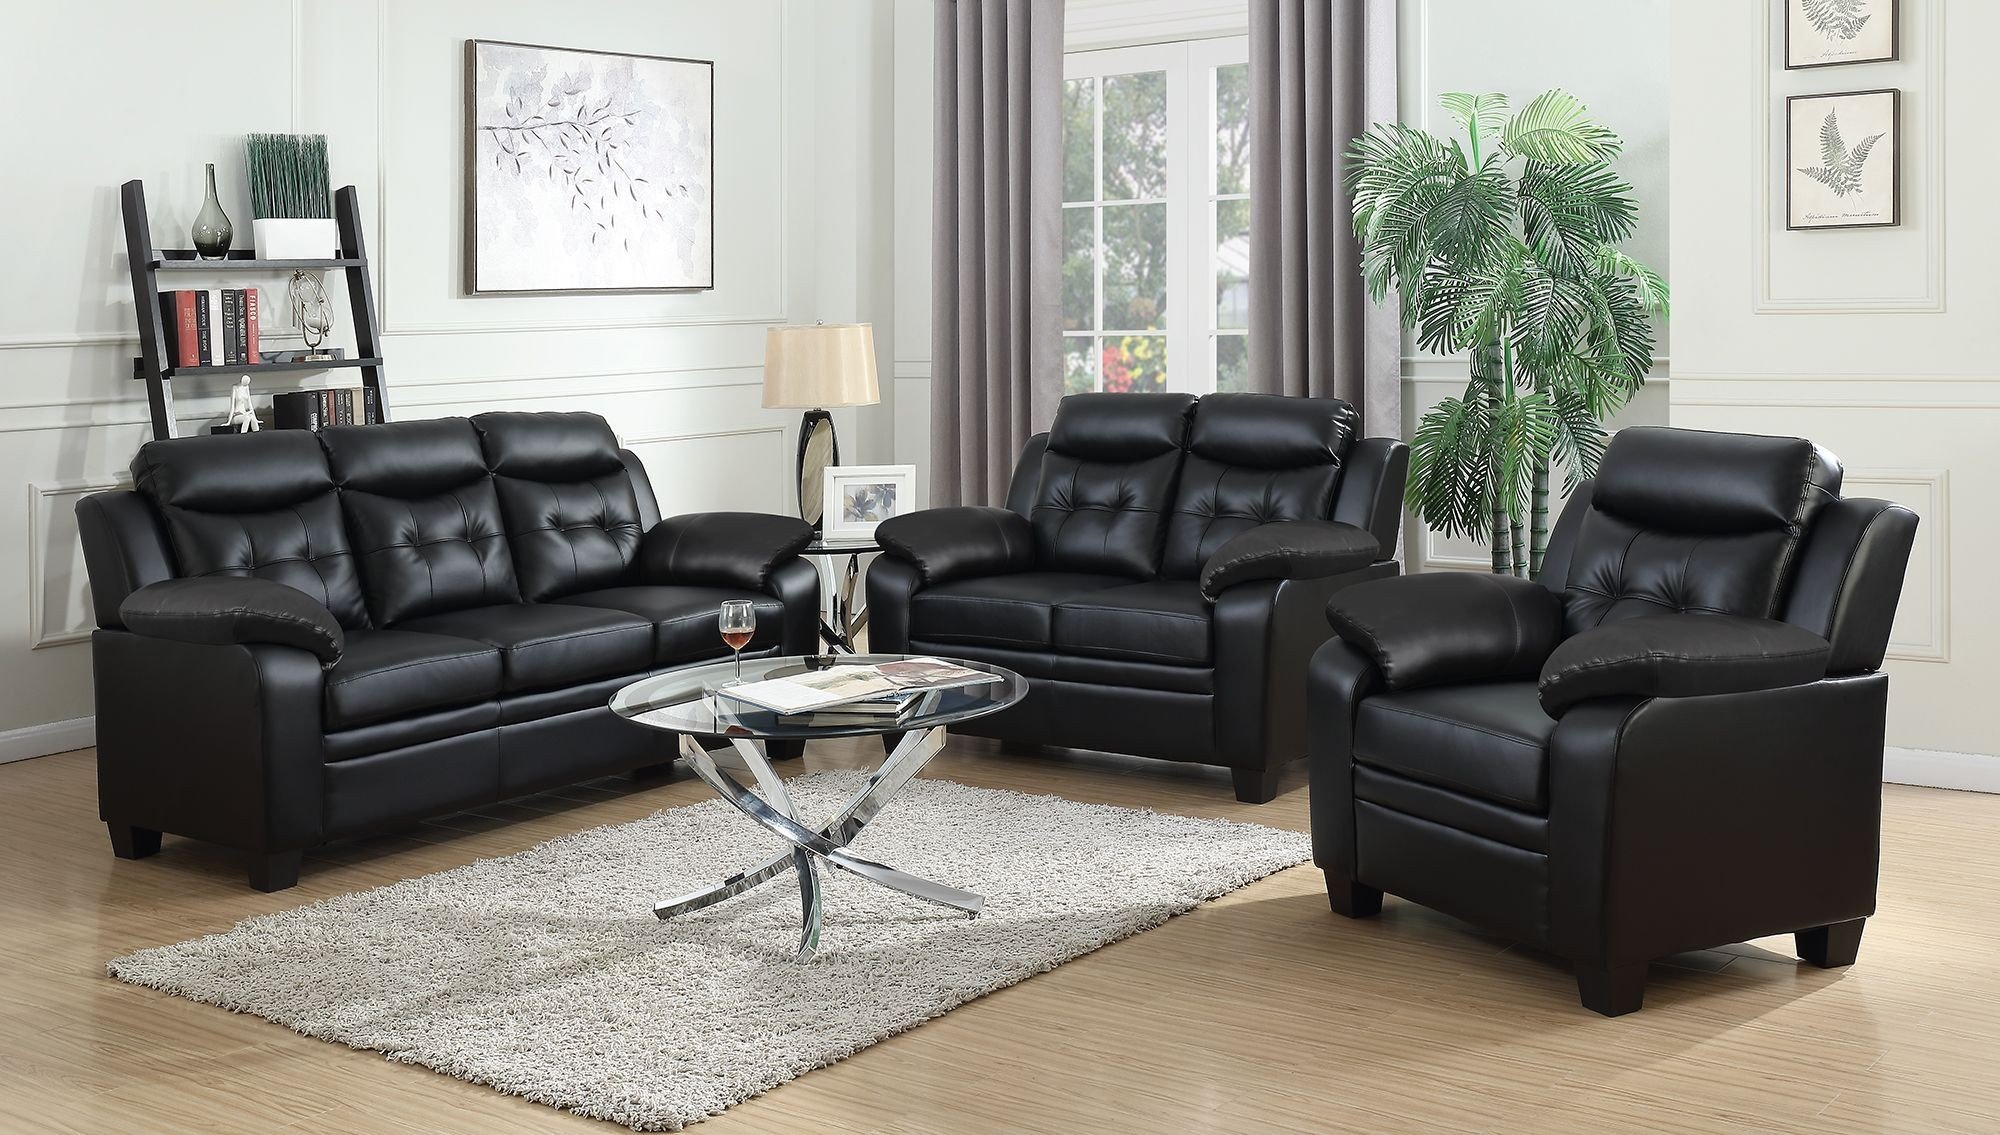 Finley Black Living Room Set